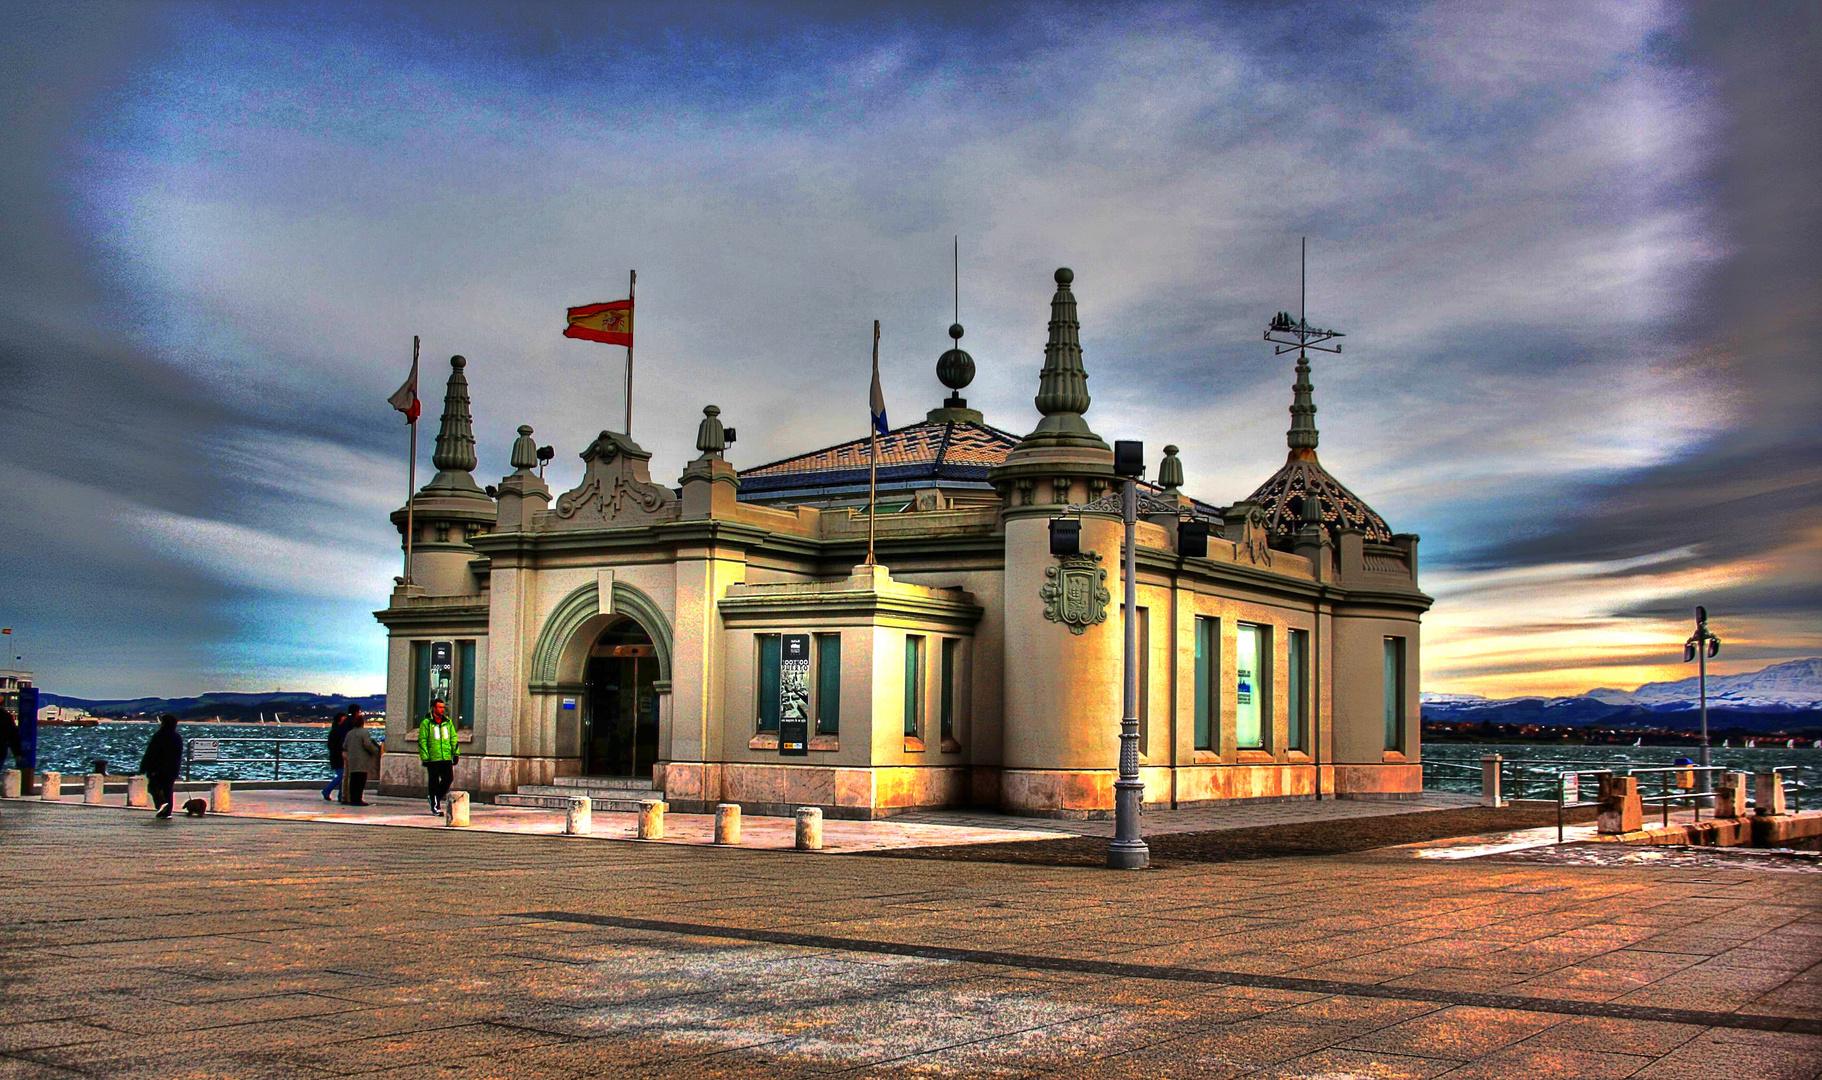 Palacete del Embarcadero (HDR)